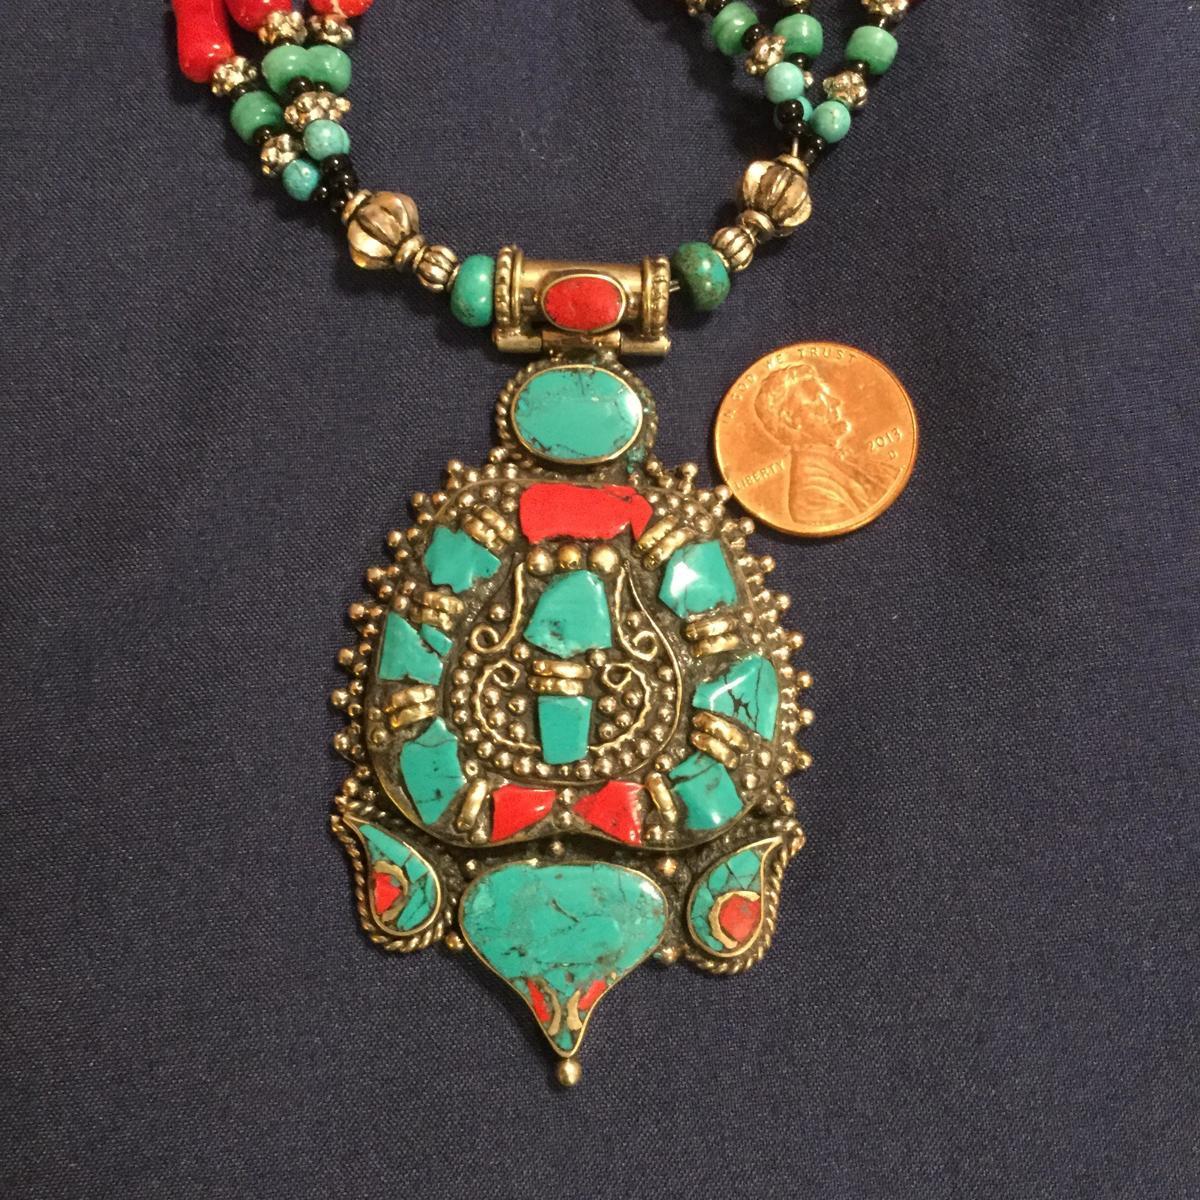 #37 Kathmandu Necklace (large view)